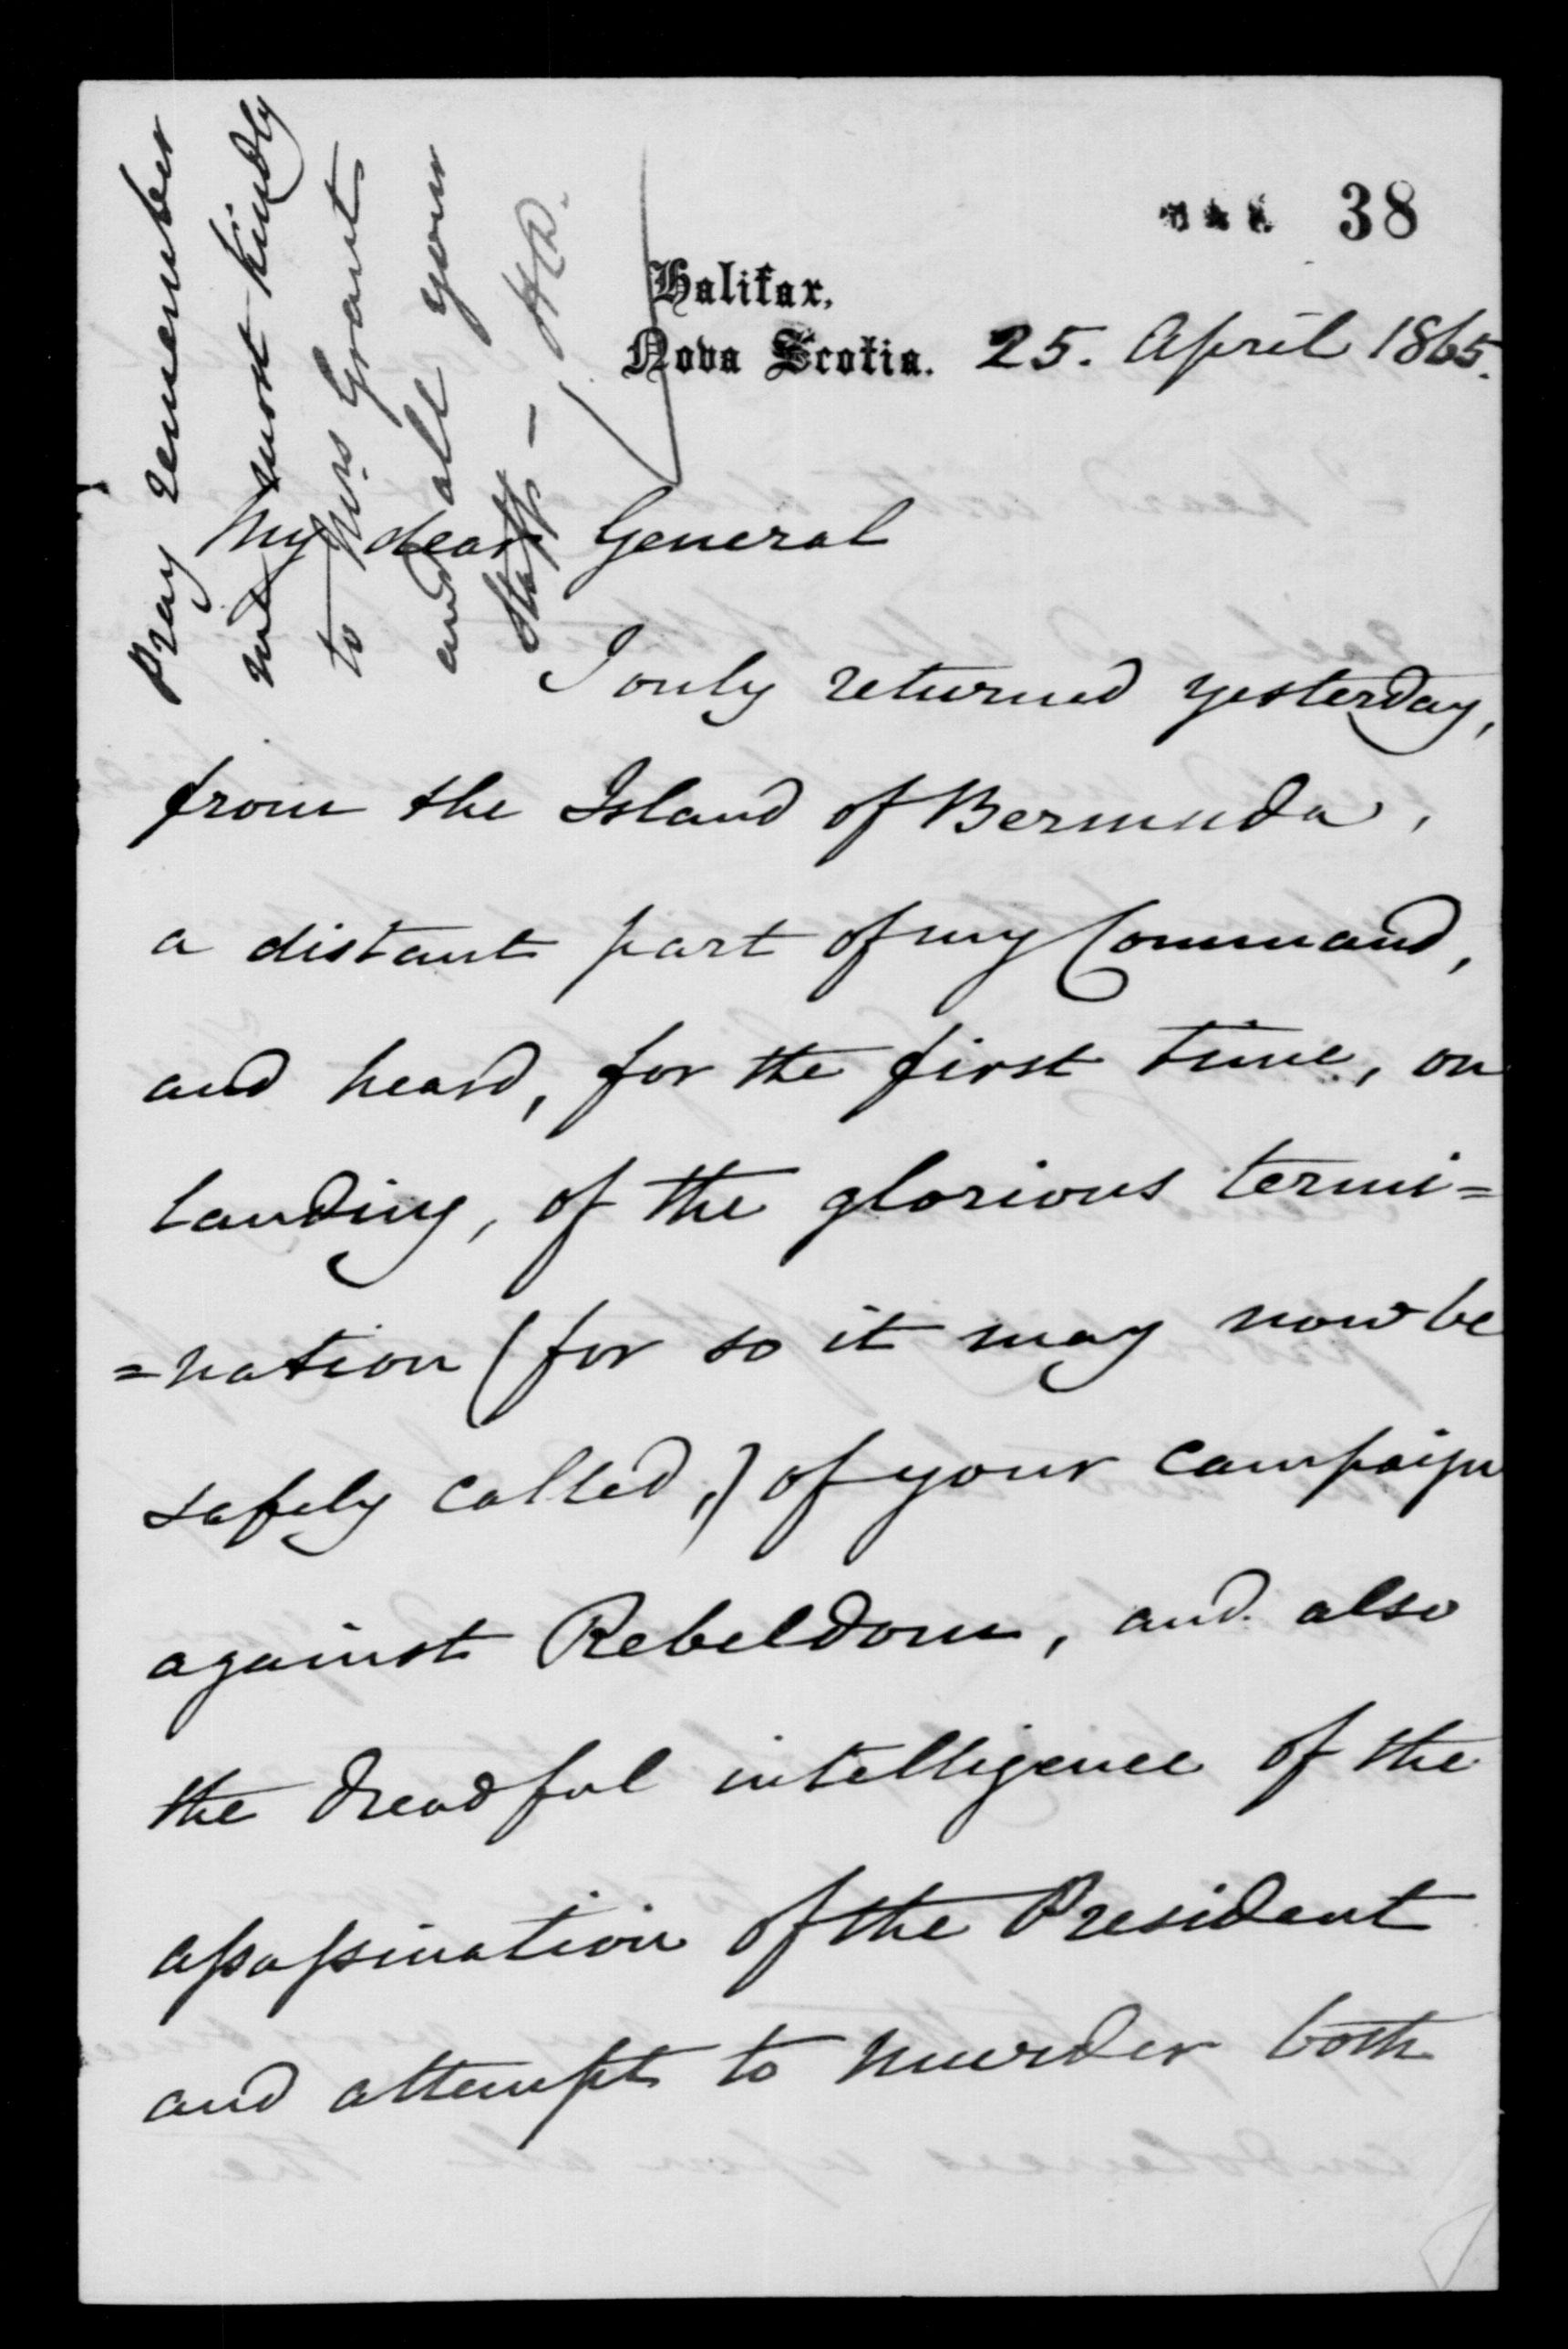 Sir Charles Hastings Doyle to Ulysses S. Grant